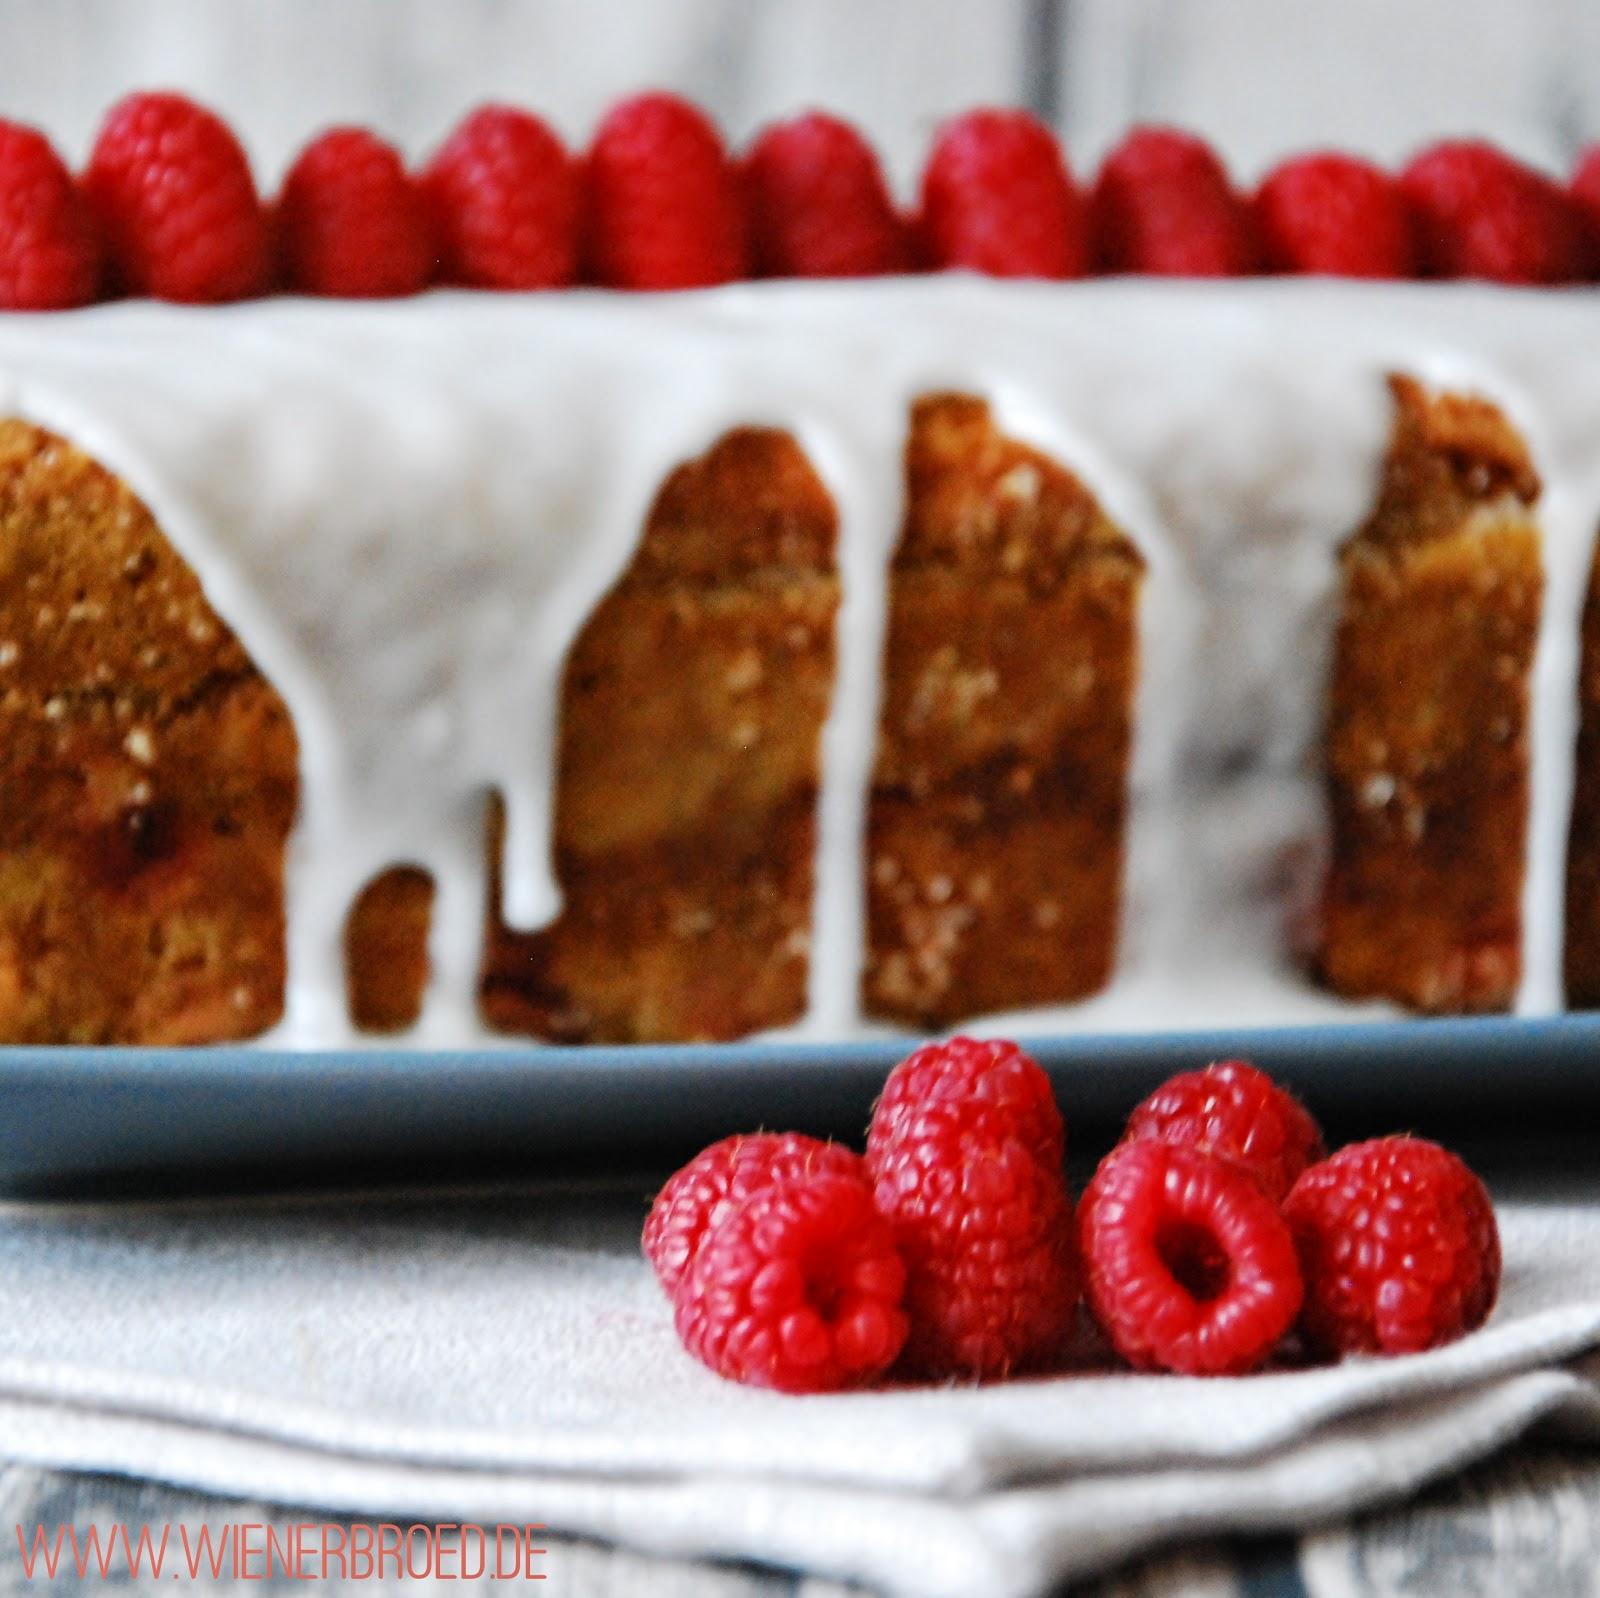 Raspberry creme fraiche cake